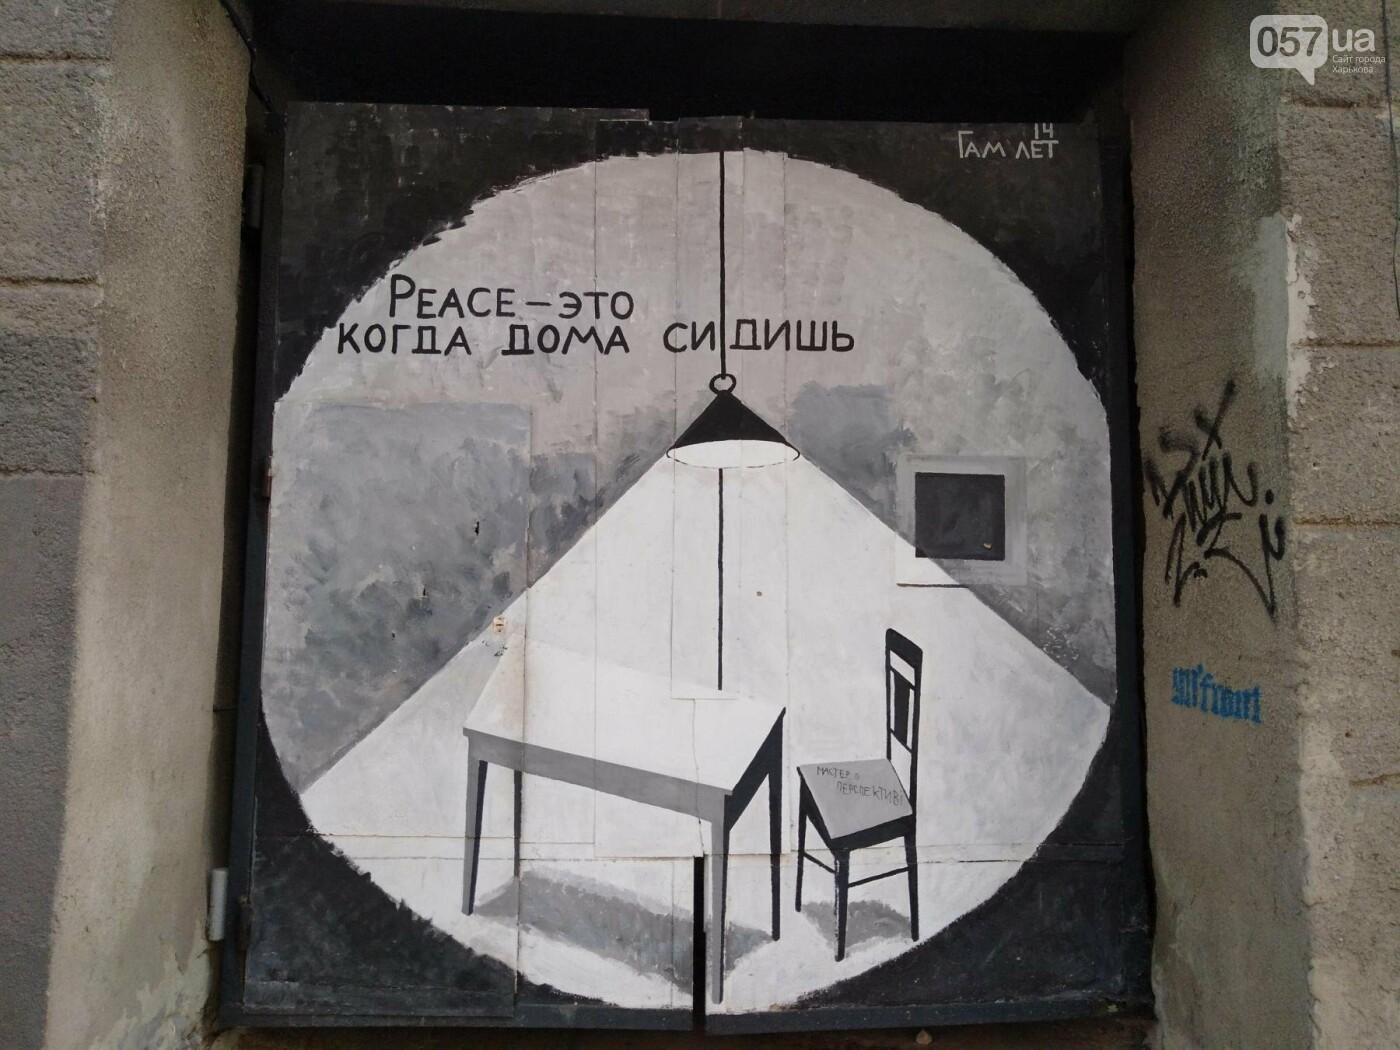 Стрит-арт Гамлета в Харькове: ТОП-10 граффити художника, - ФОТО, фото-17